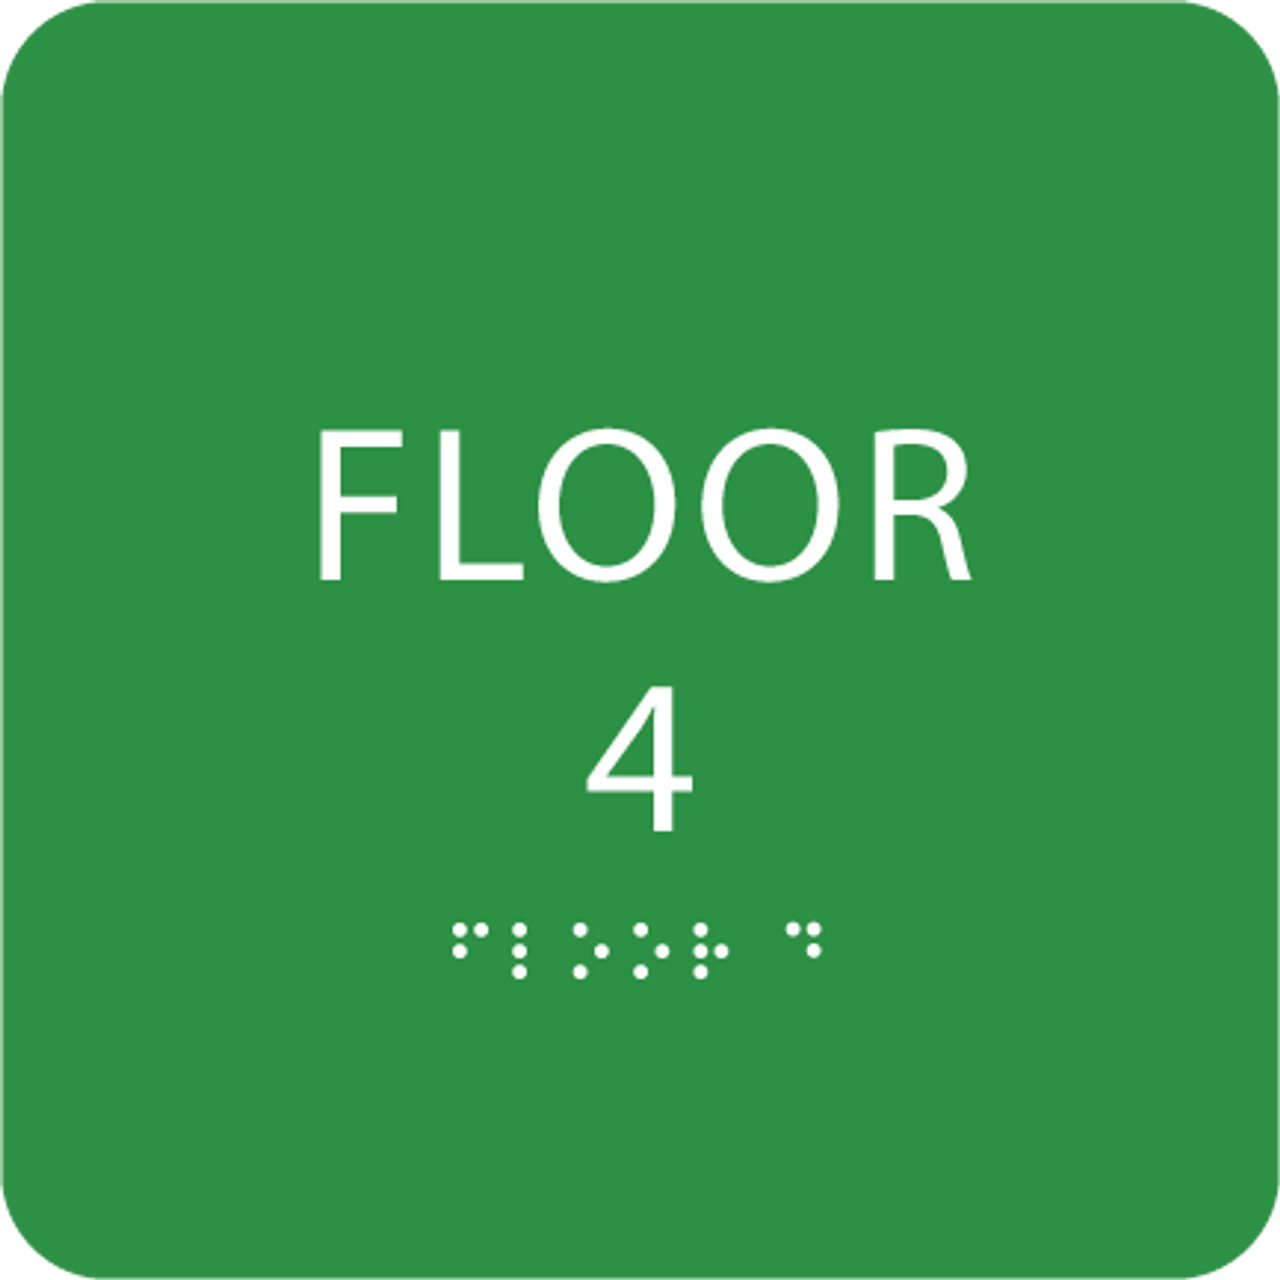 Green Floor 4 Level Sign